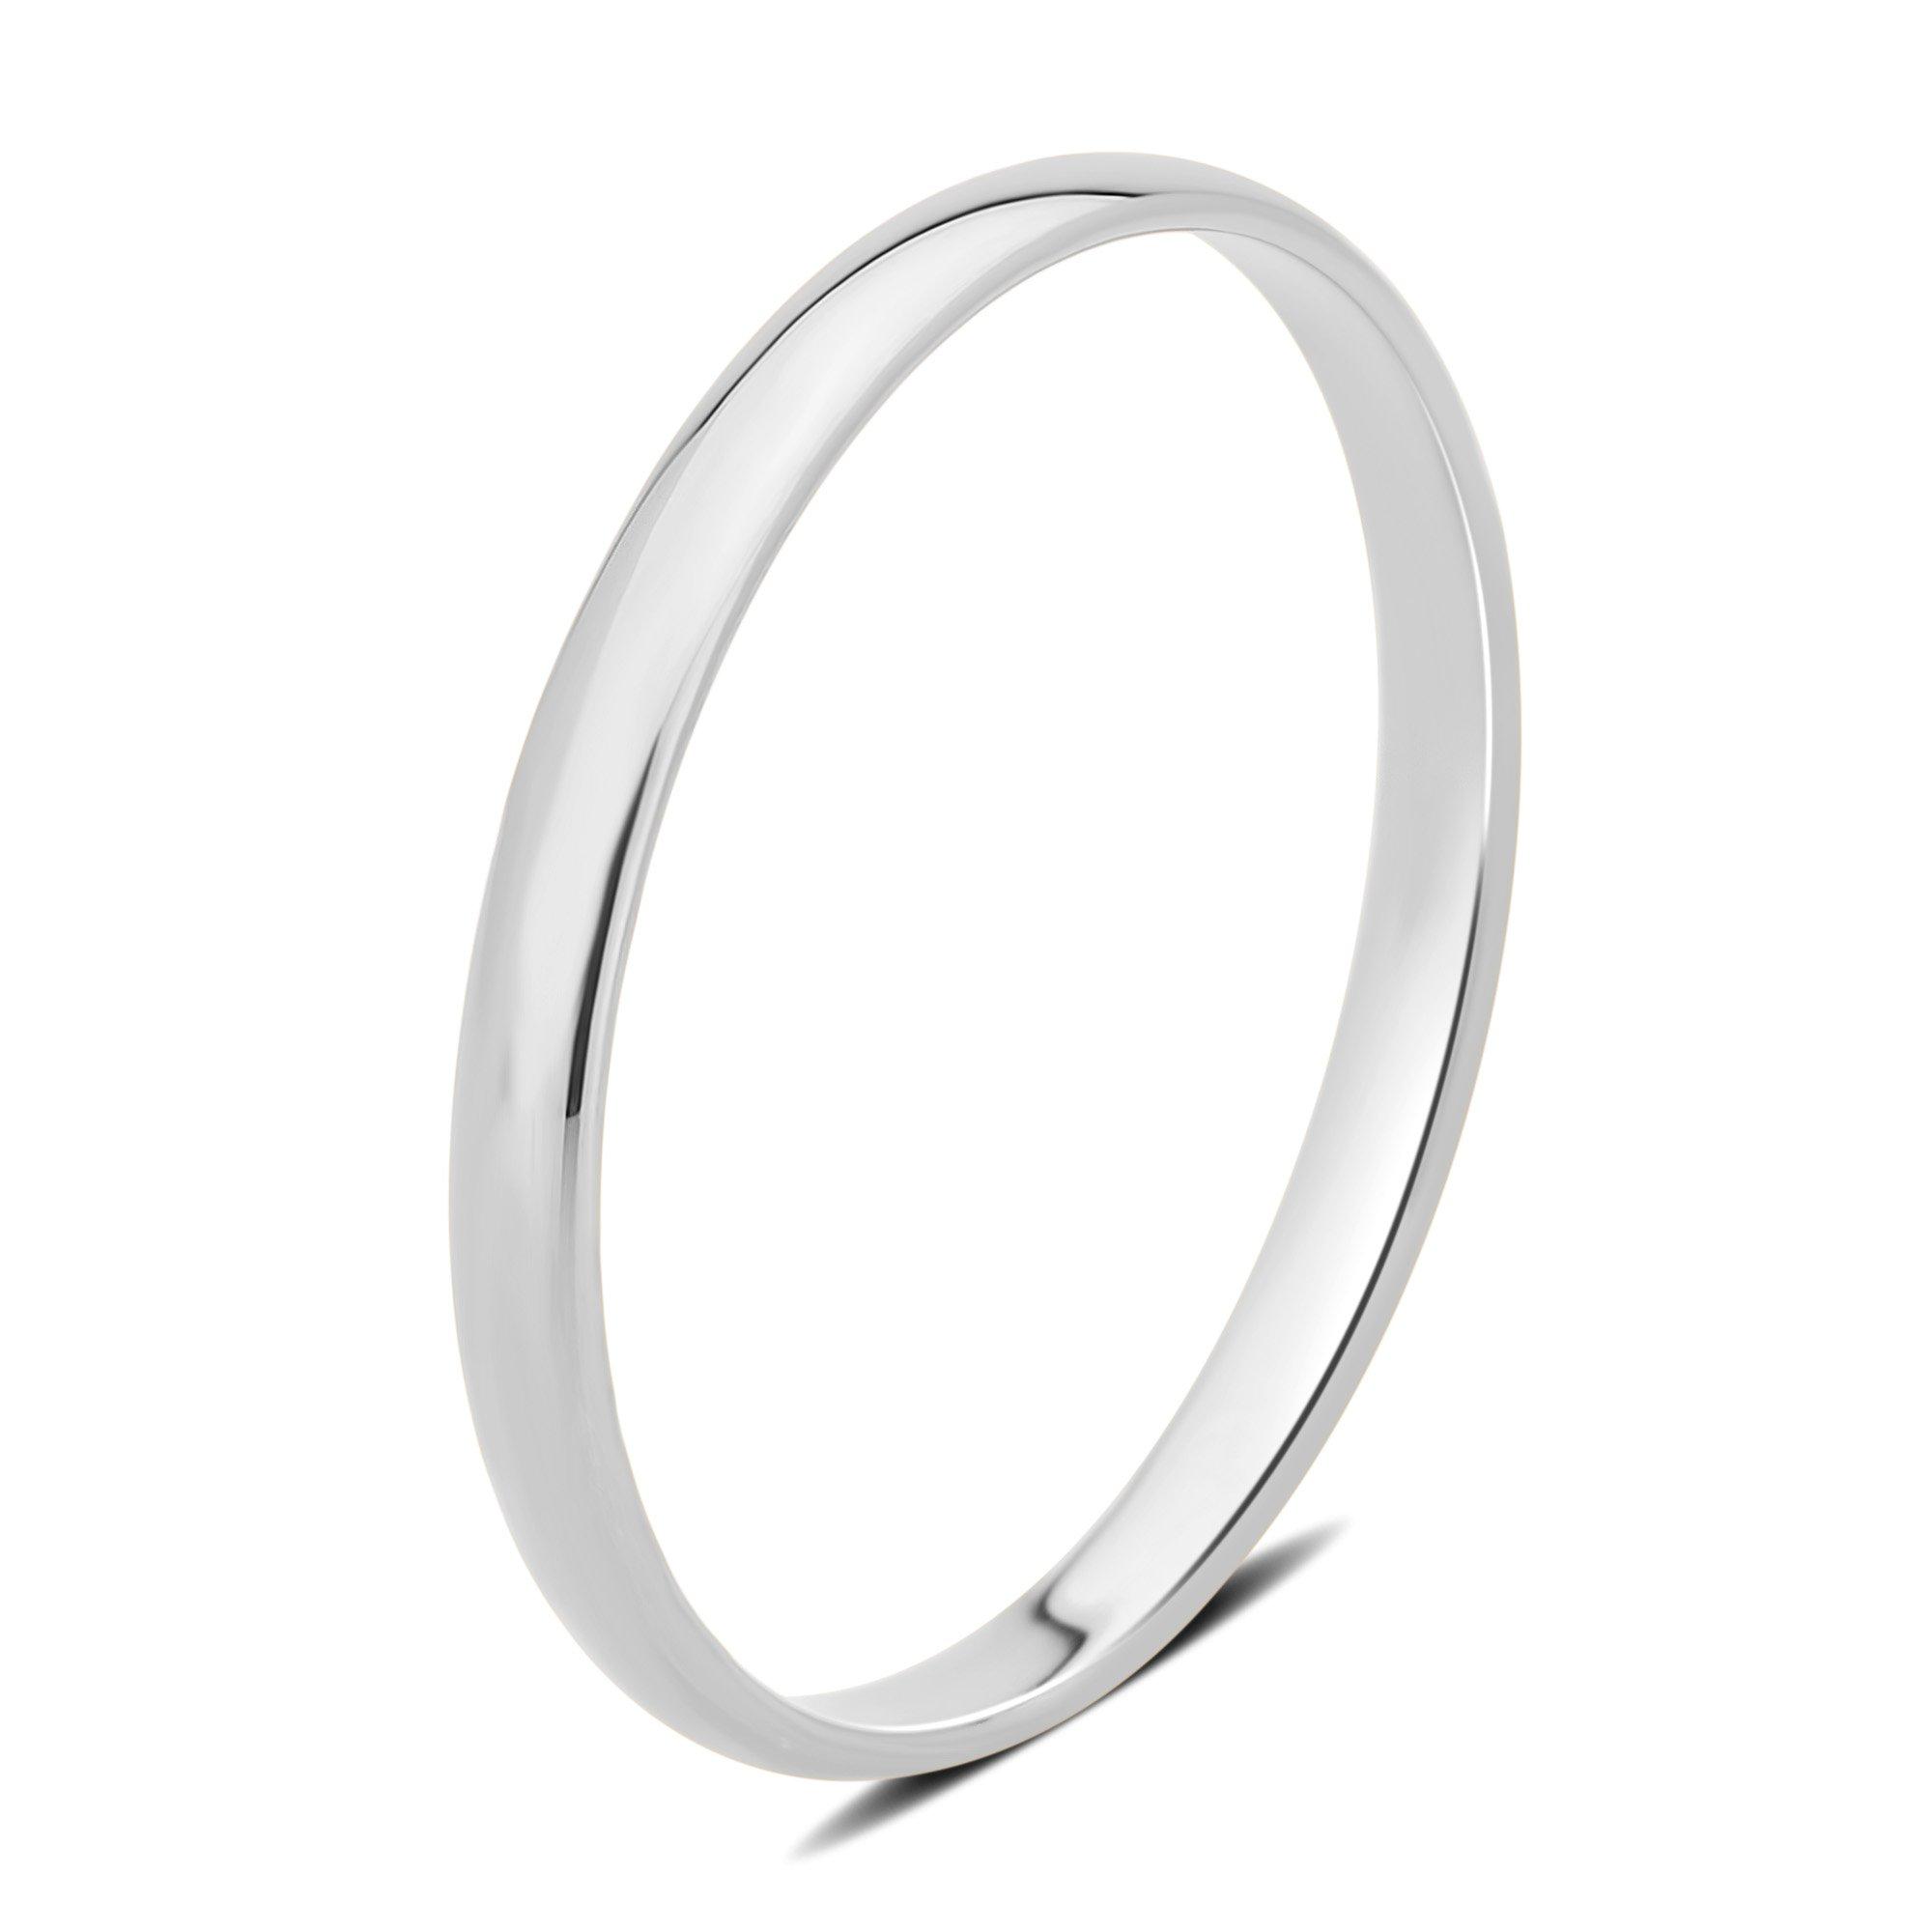 DiamondMuse 2 mm Plain Wedding Band in 10K White Gold (9)